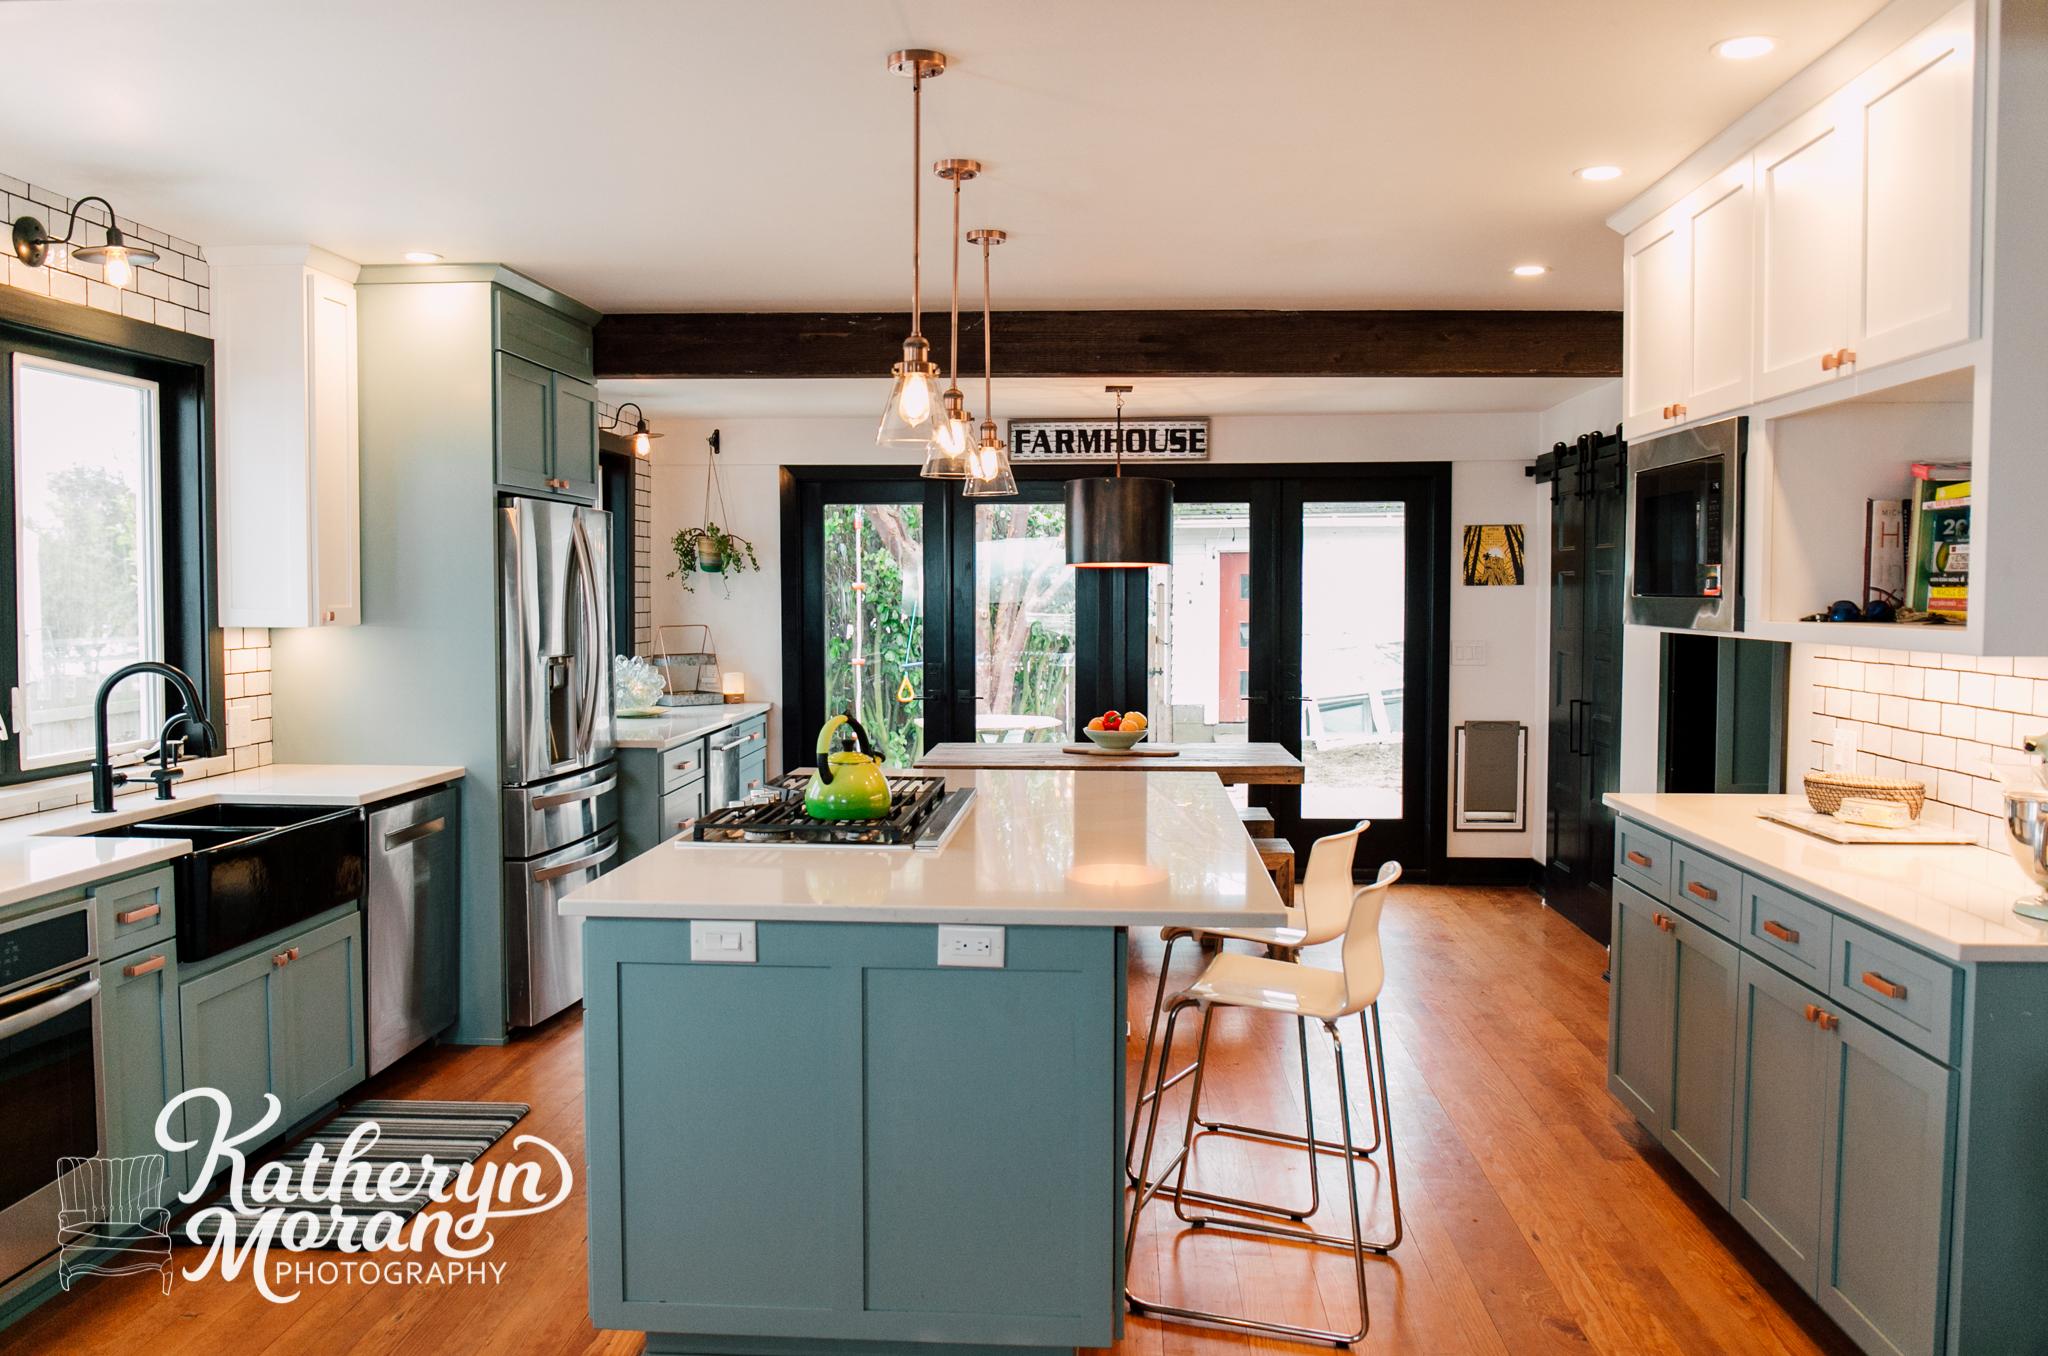 bellingham-photographer-katheryn-moran-jennifer-ryan-designs-interior-design-ferndale-kitchen-2019-1-1.jpg